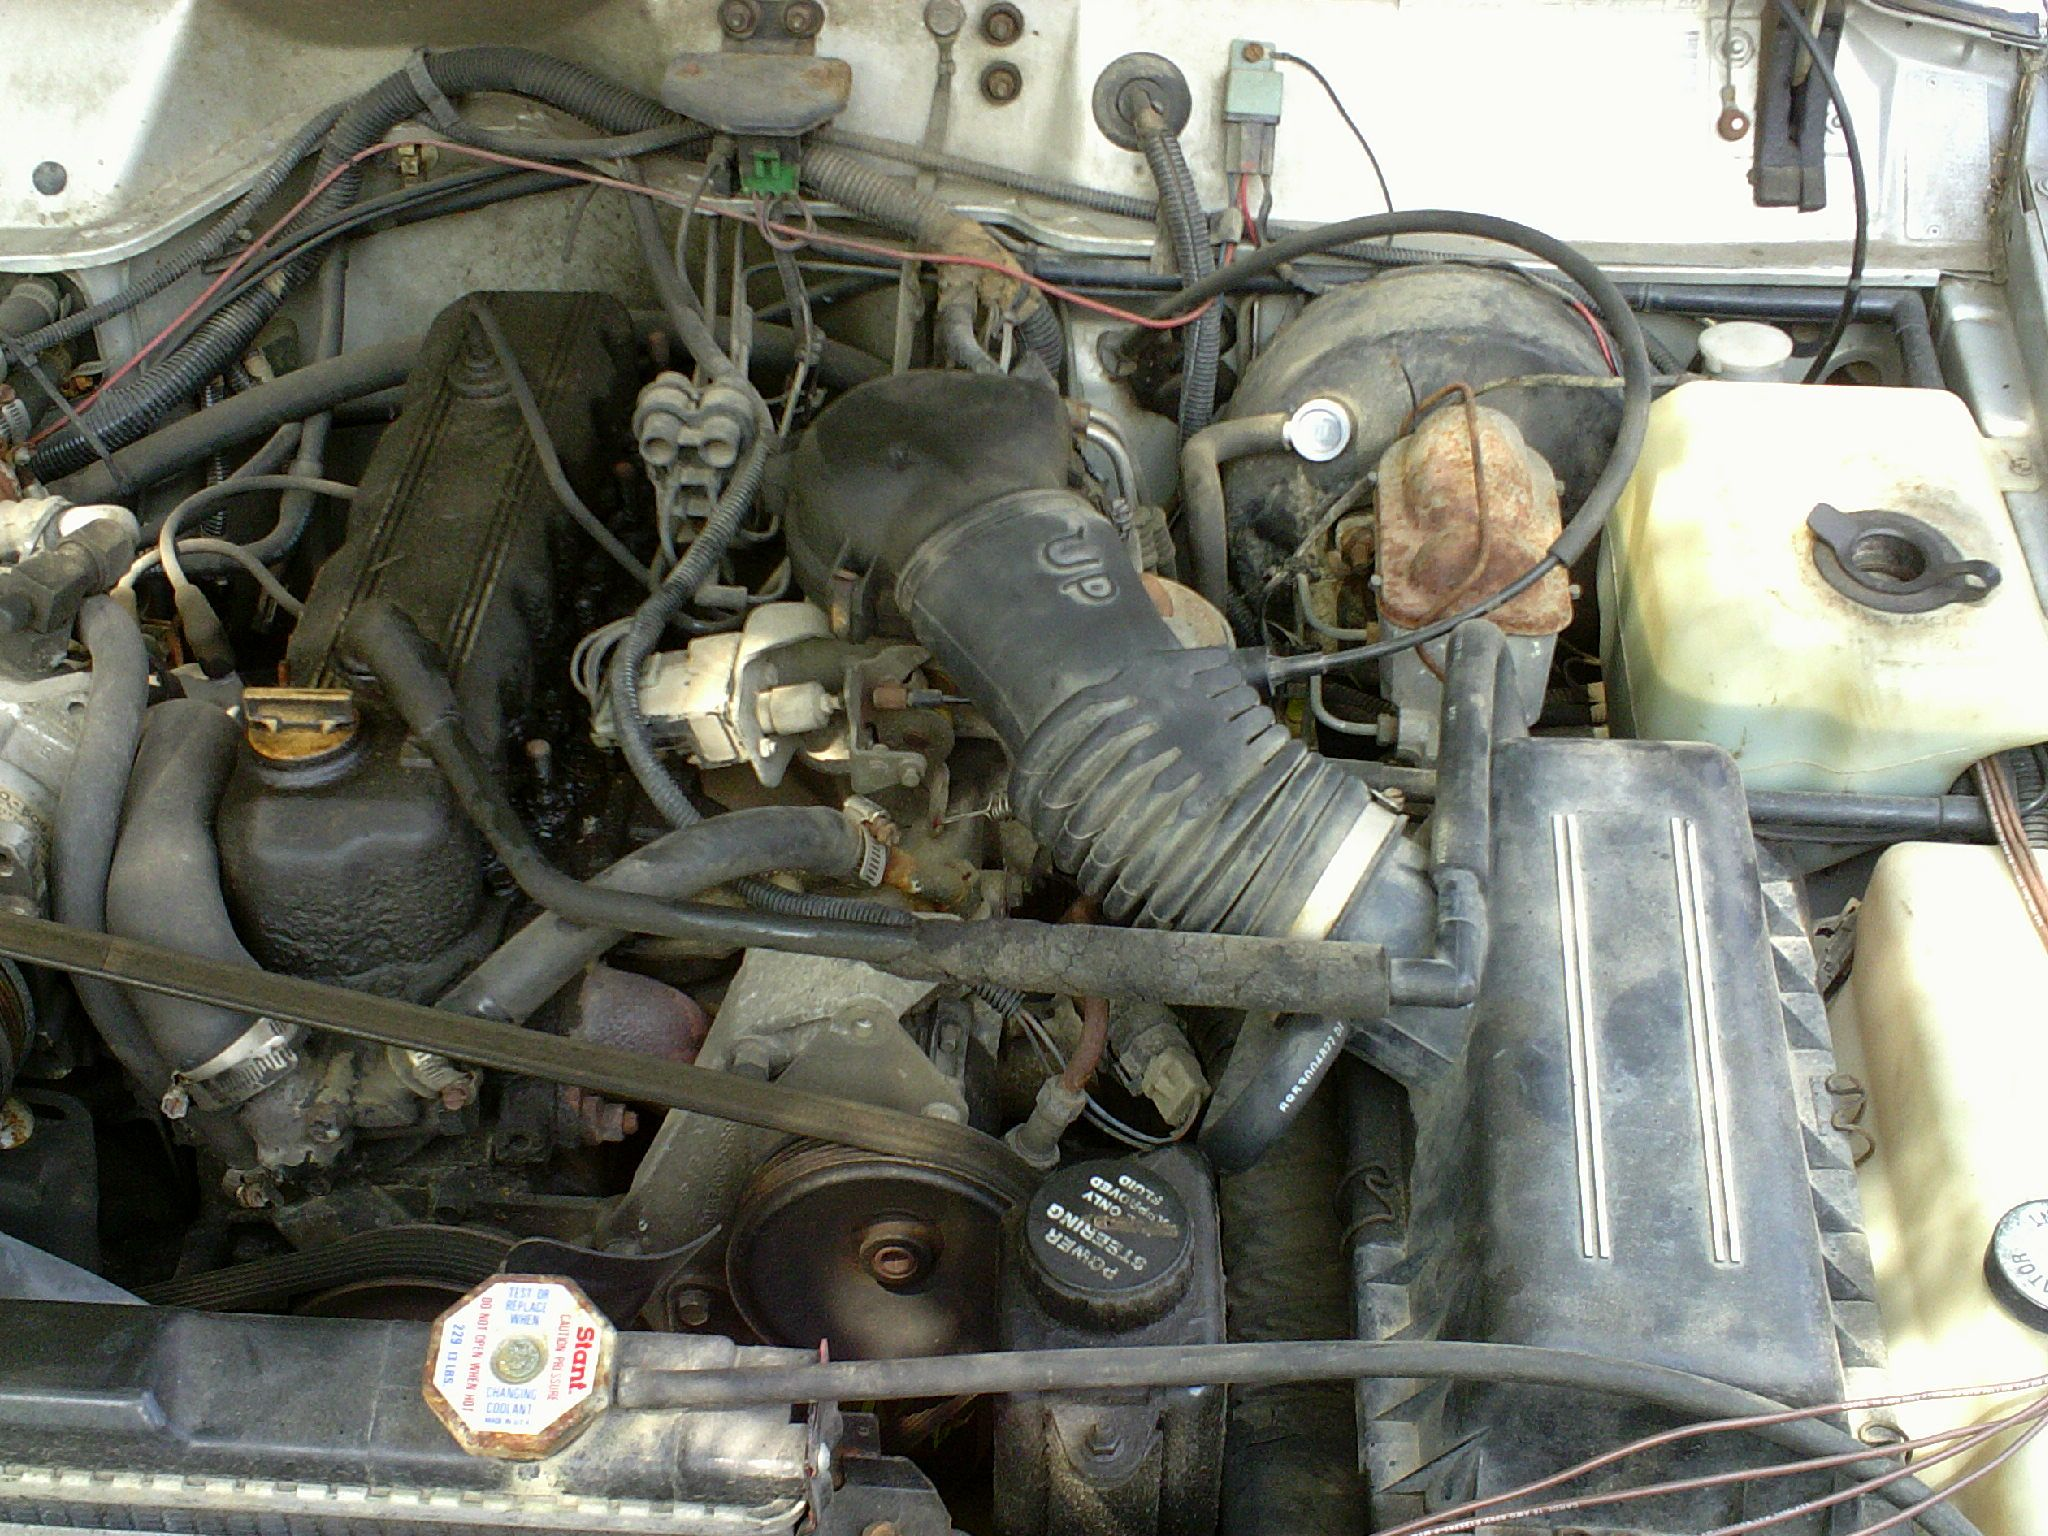 2.5l Jeep Engine For Sale Jpeg - //carimagescolay.casa/2-5l ...